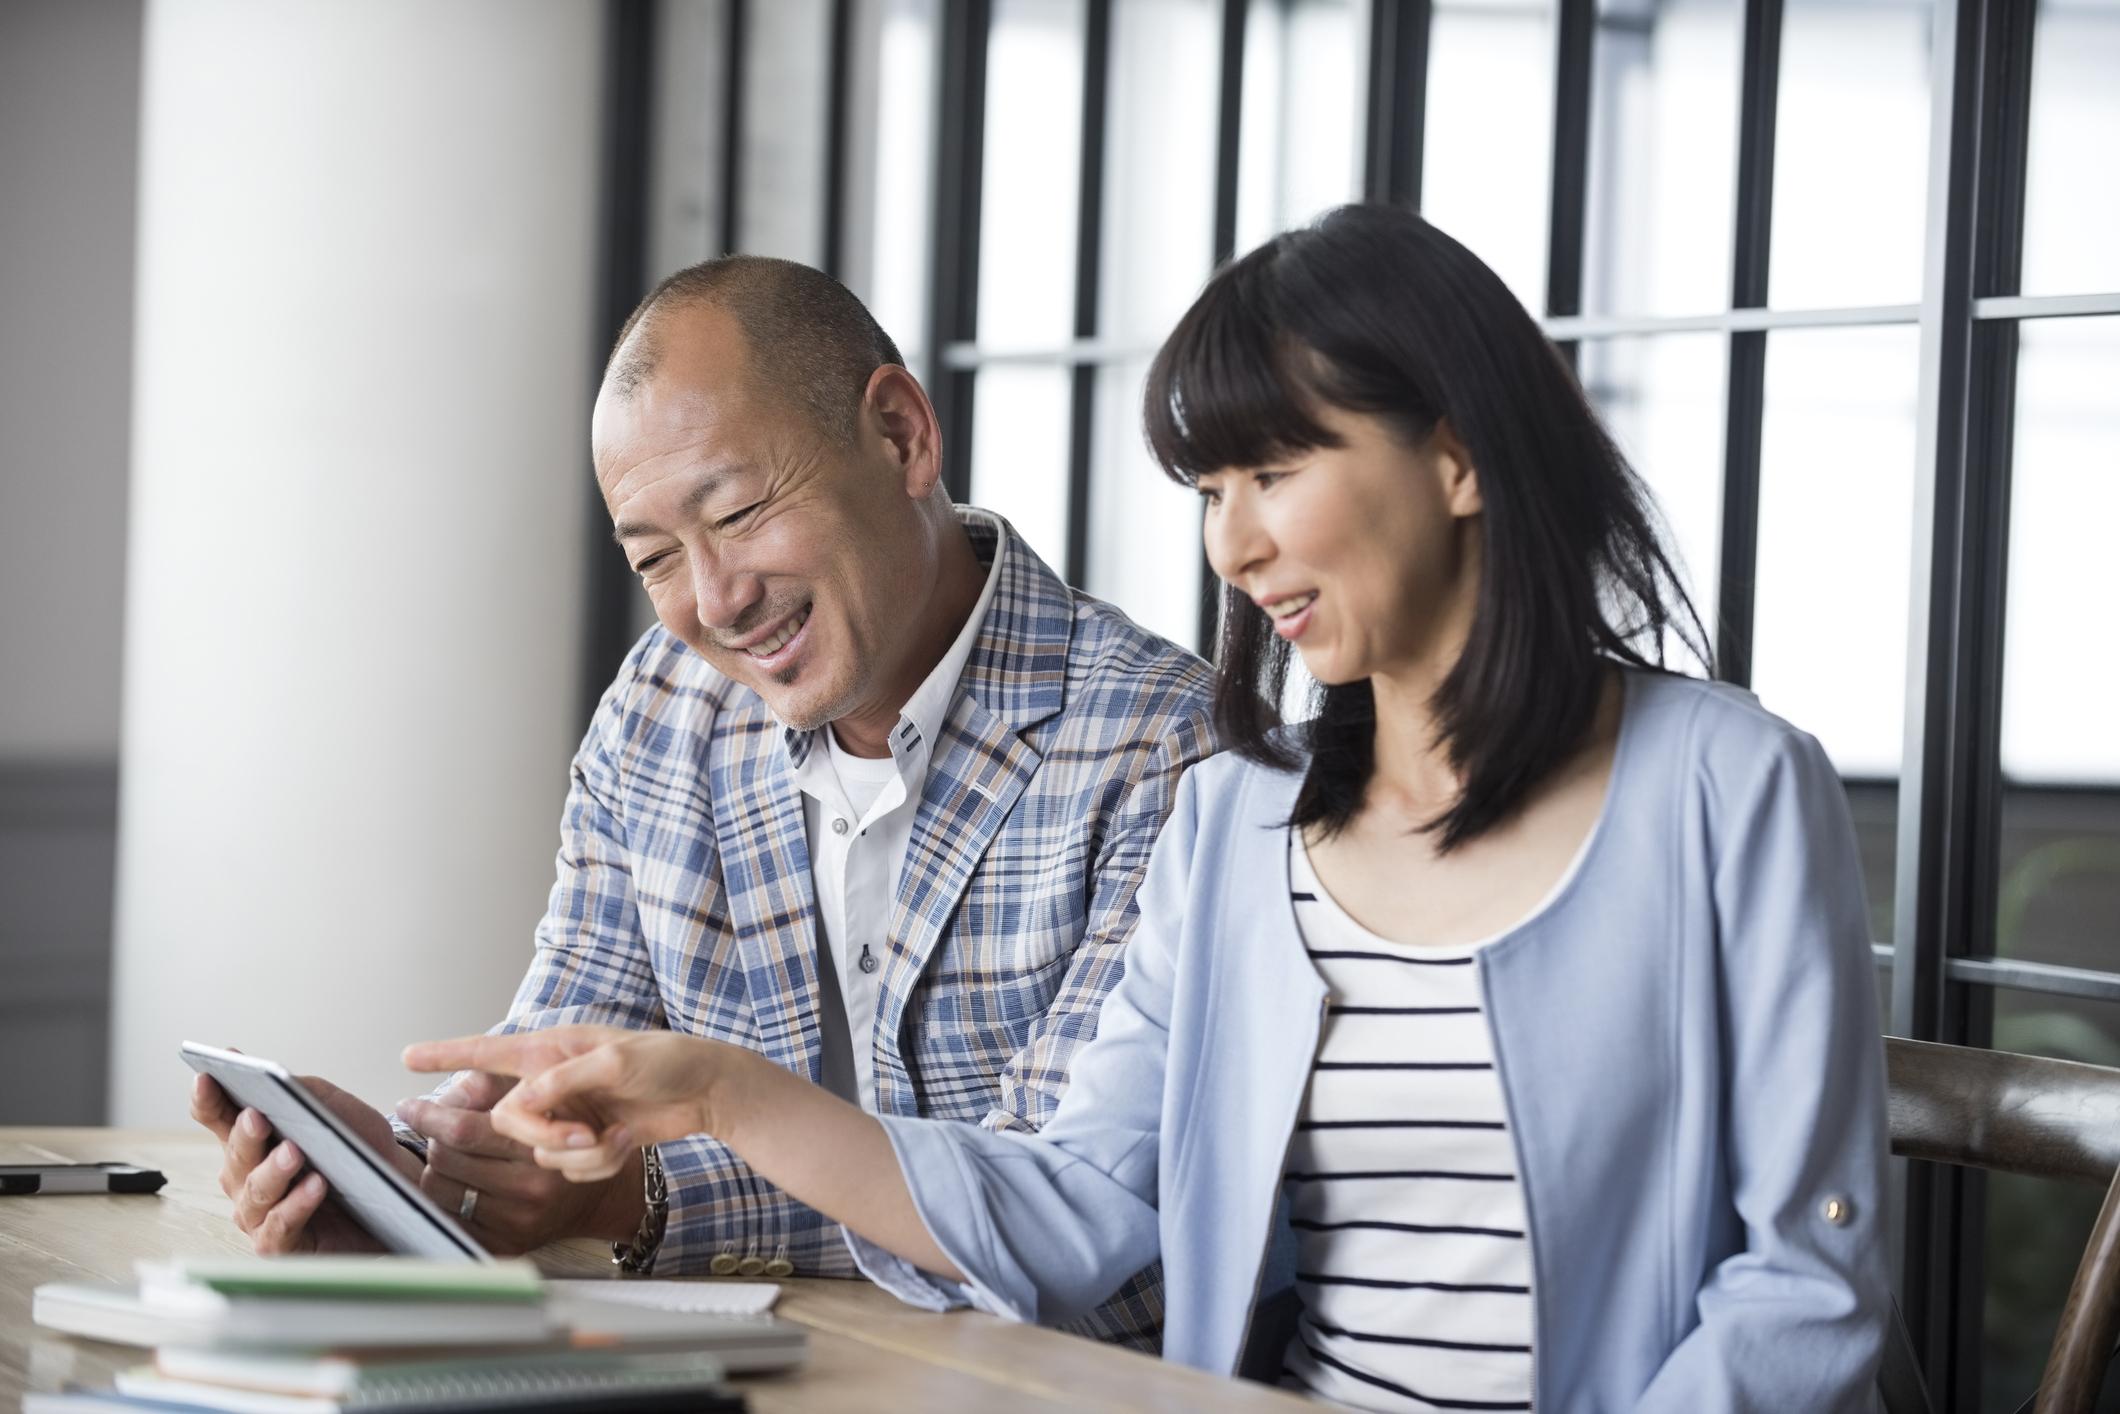 Mature Japanese businessman looking at digital tablet. Asian man and woman looking at digital tablet.